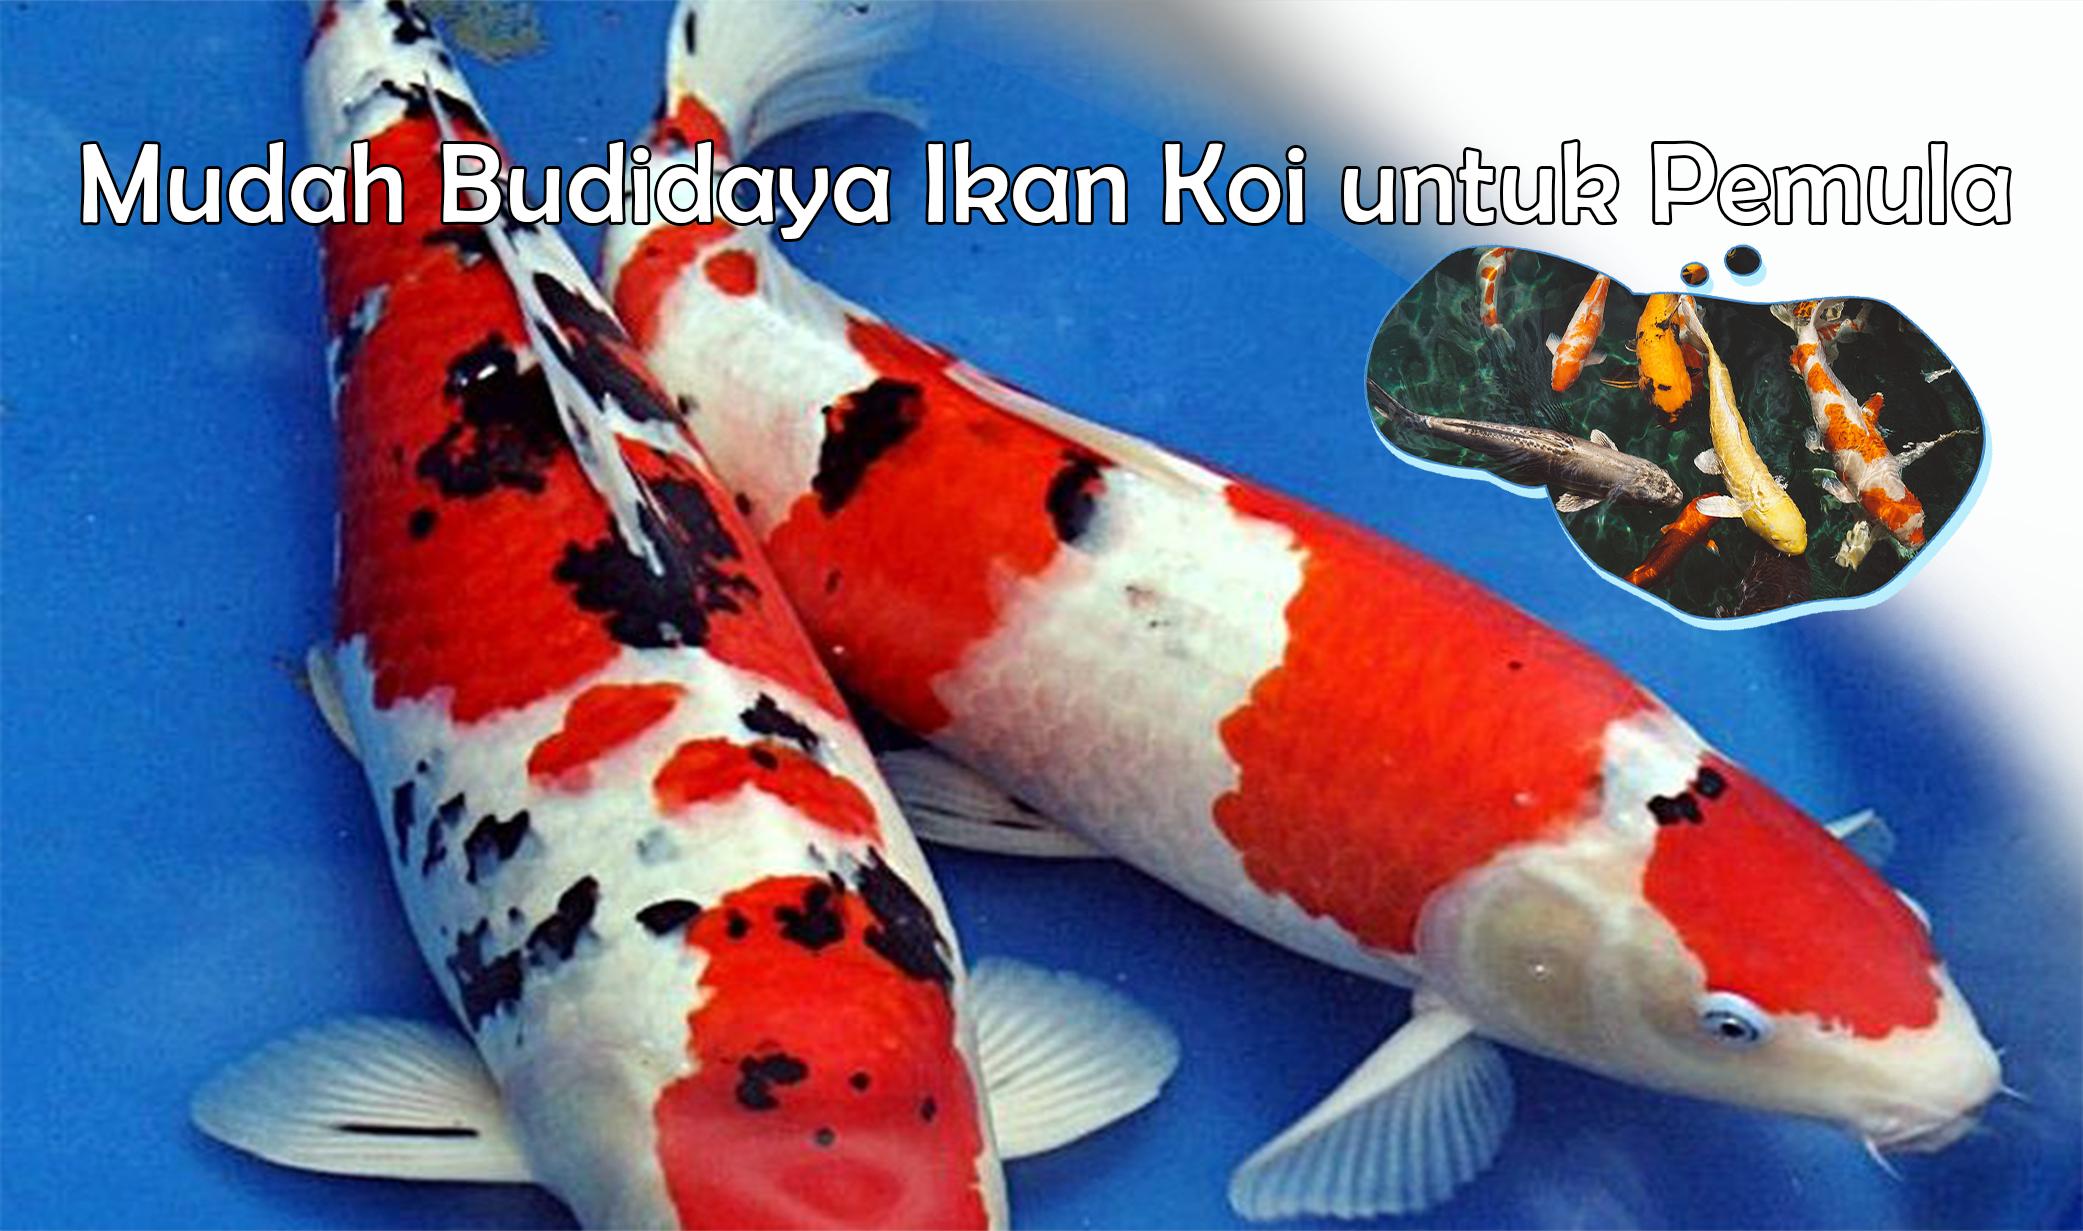 Mudah Budidaya Ikan Koi untuk Pemula